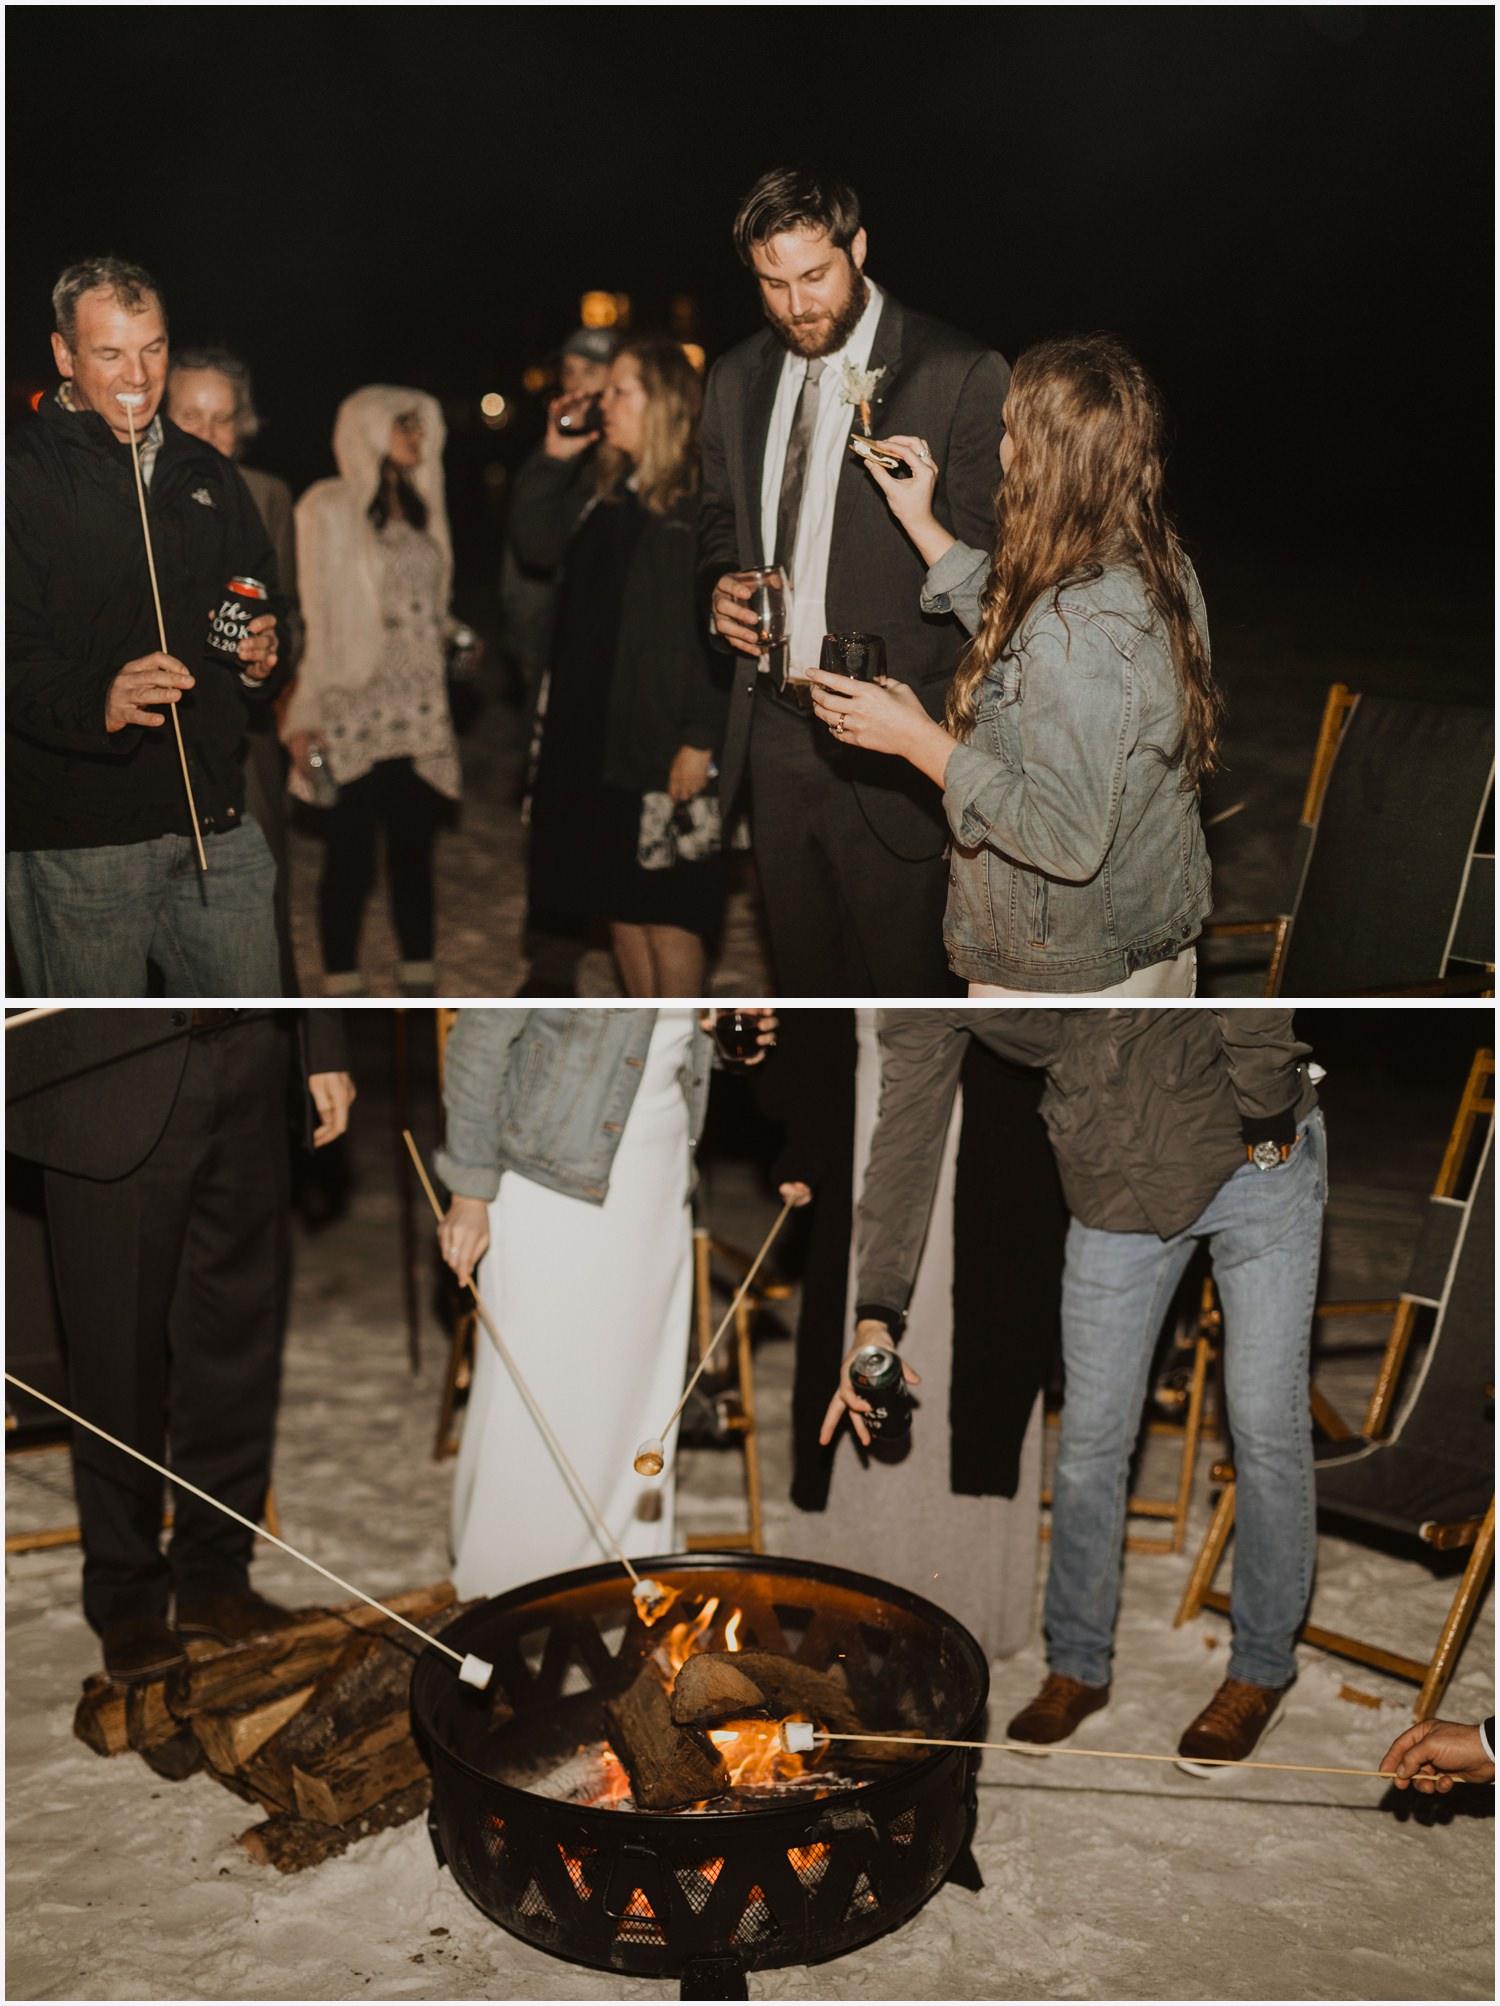 Grayton Beach Catering Wedding Bonfire